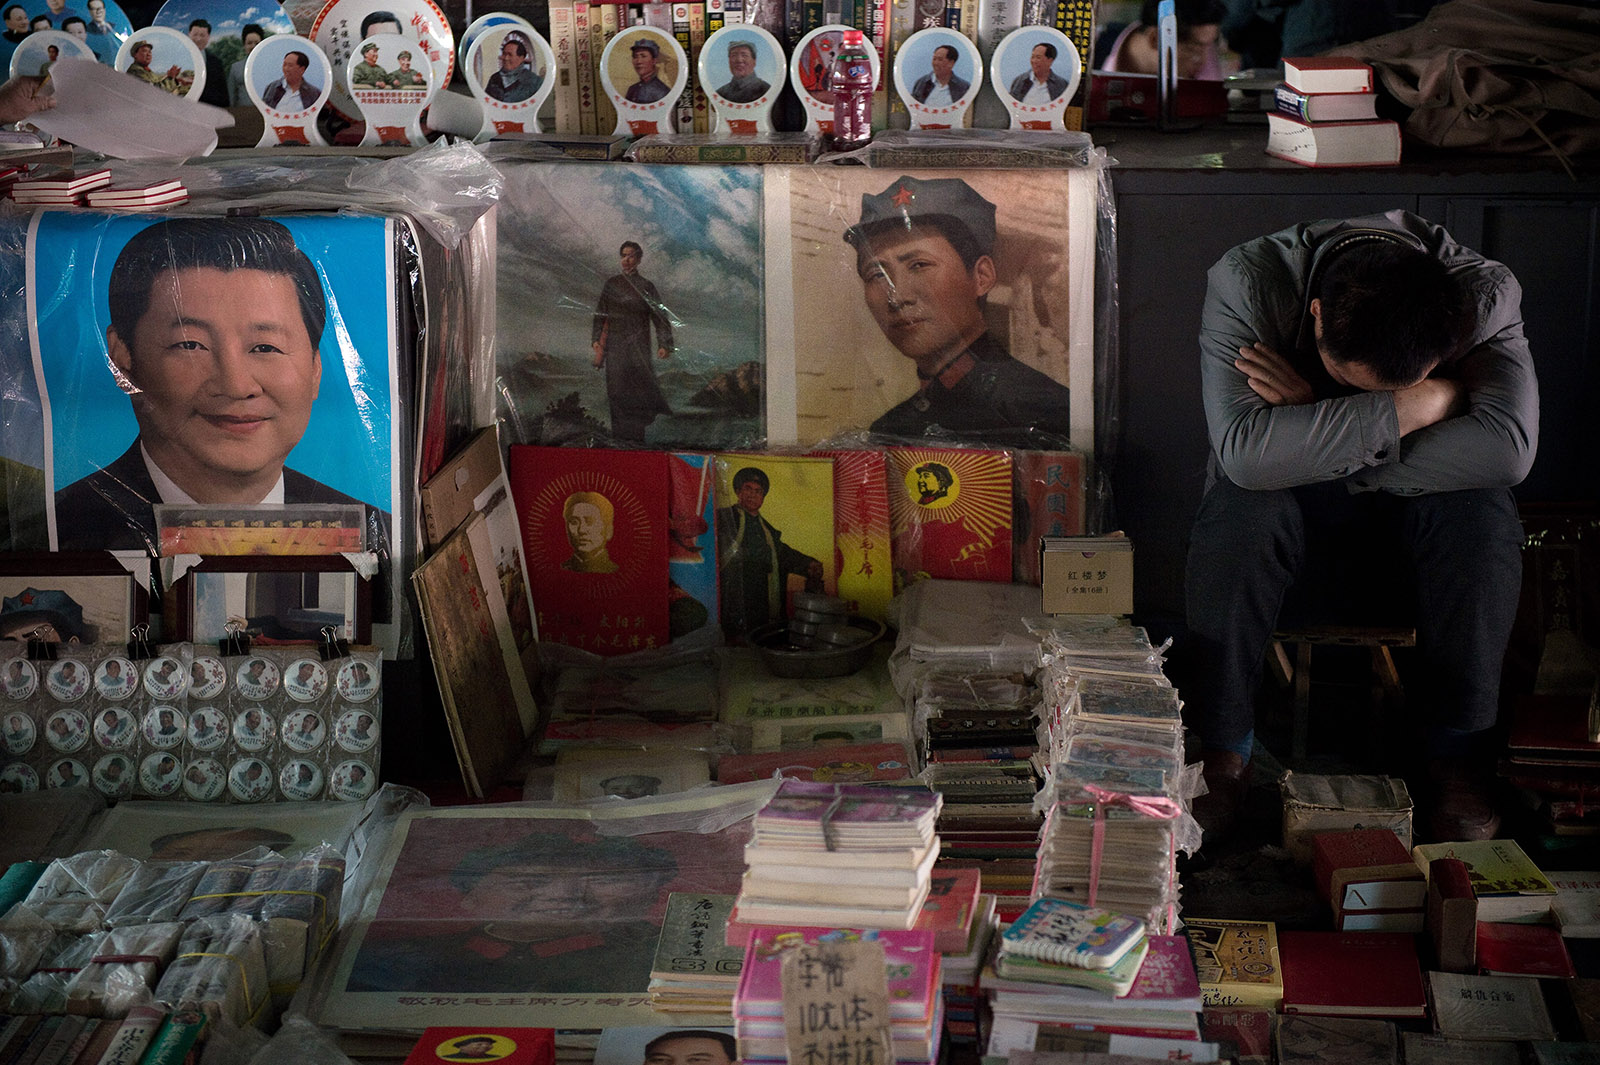 Who Killed More: Hitler, Stalin, or Mao?